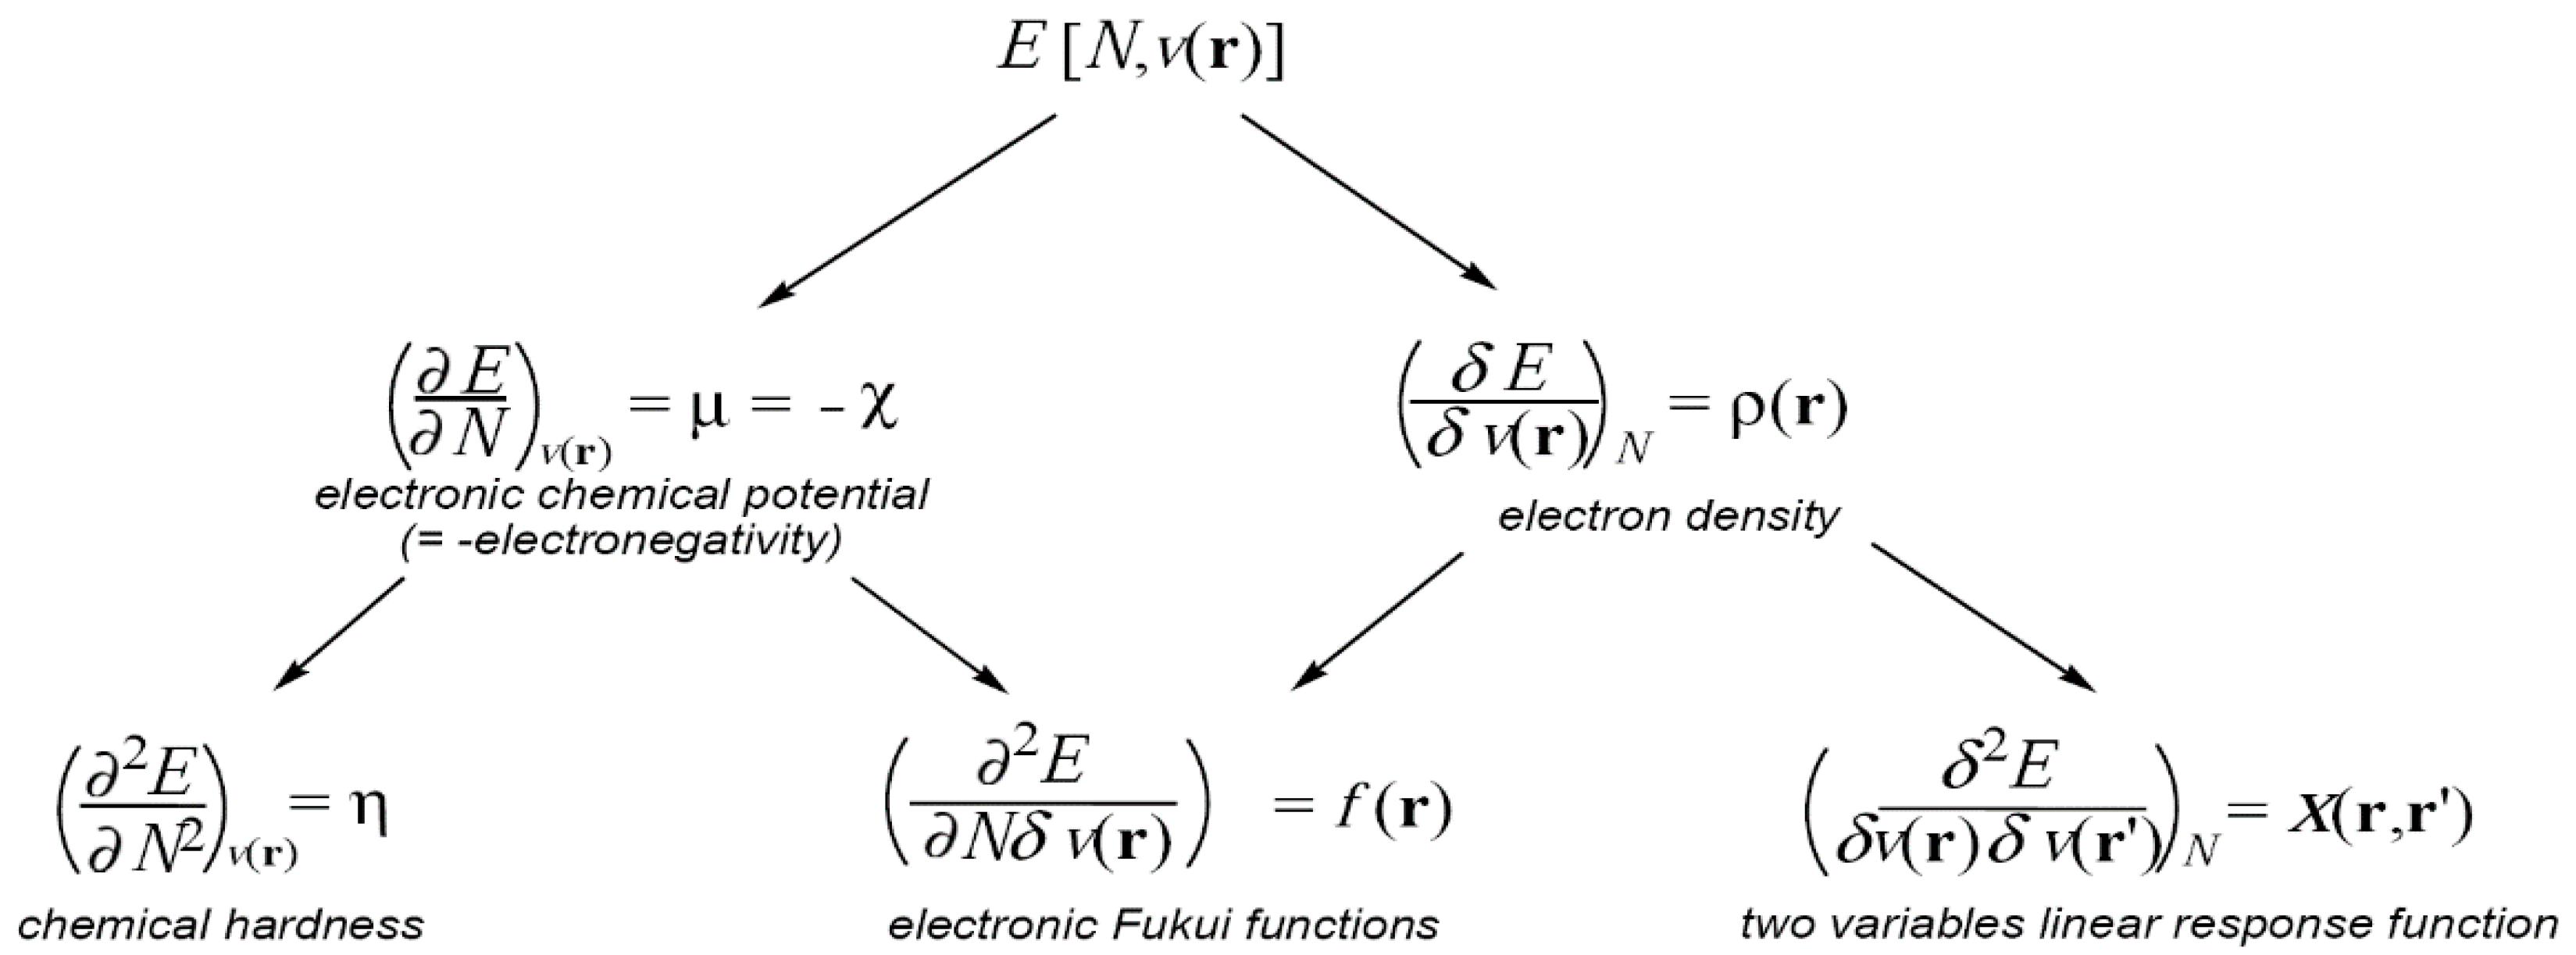 density equation chemistry. no density equation chemistry